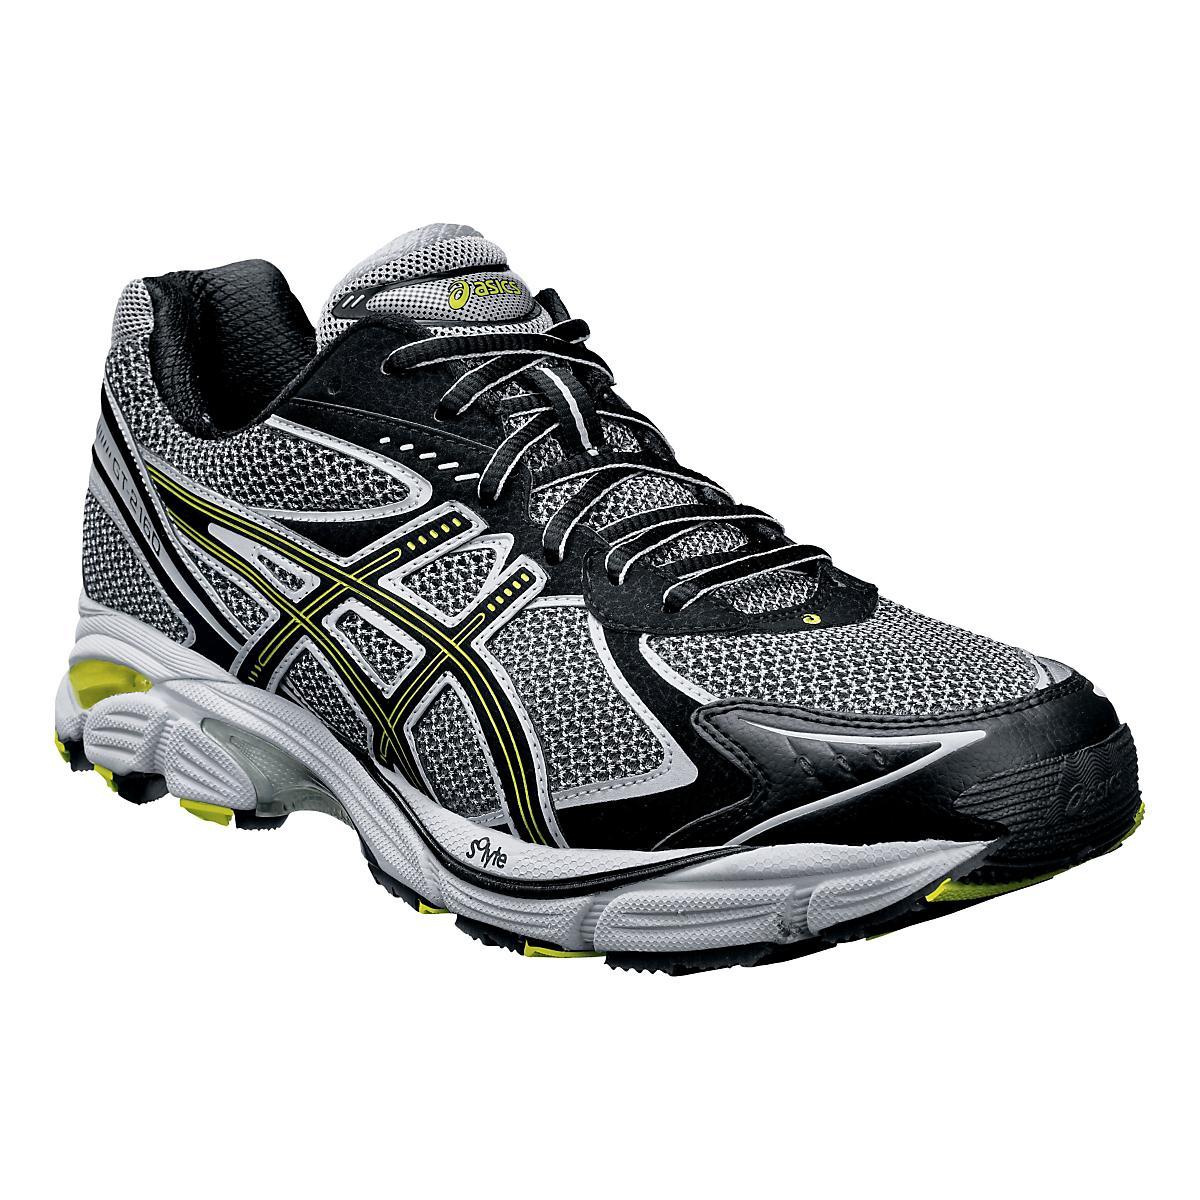 Mens ASICS GT-2160 Trail Running Shoe At Road Runner Sports